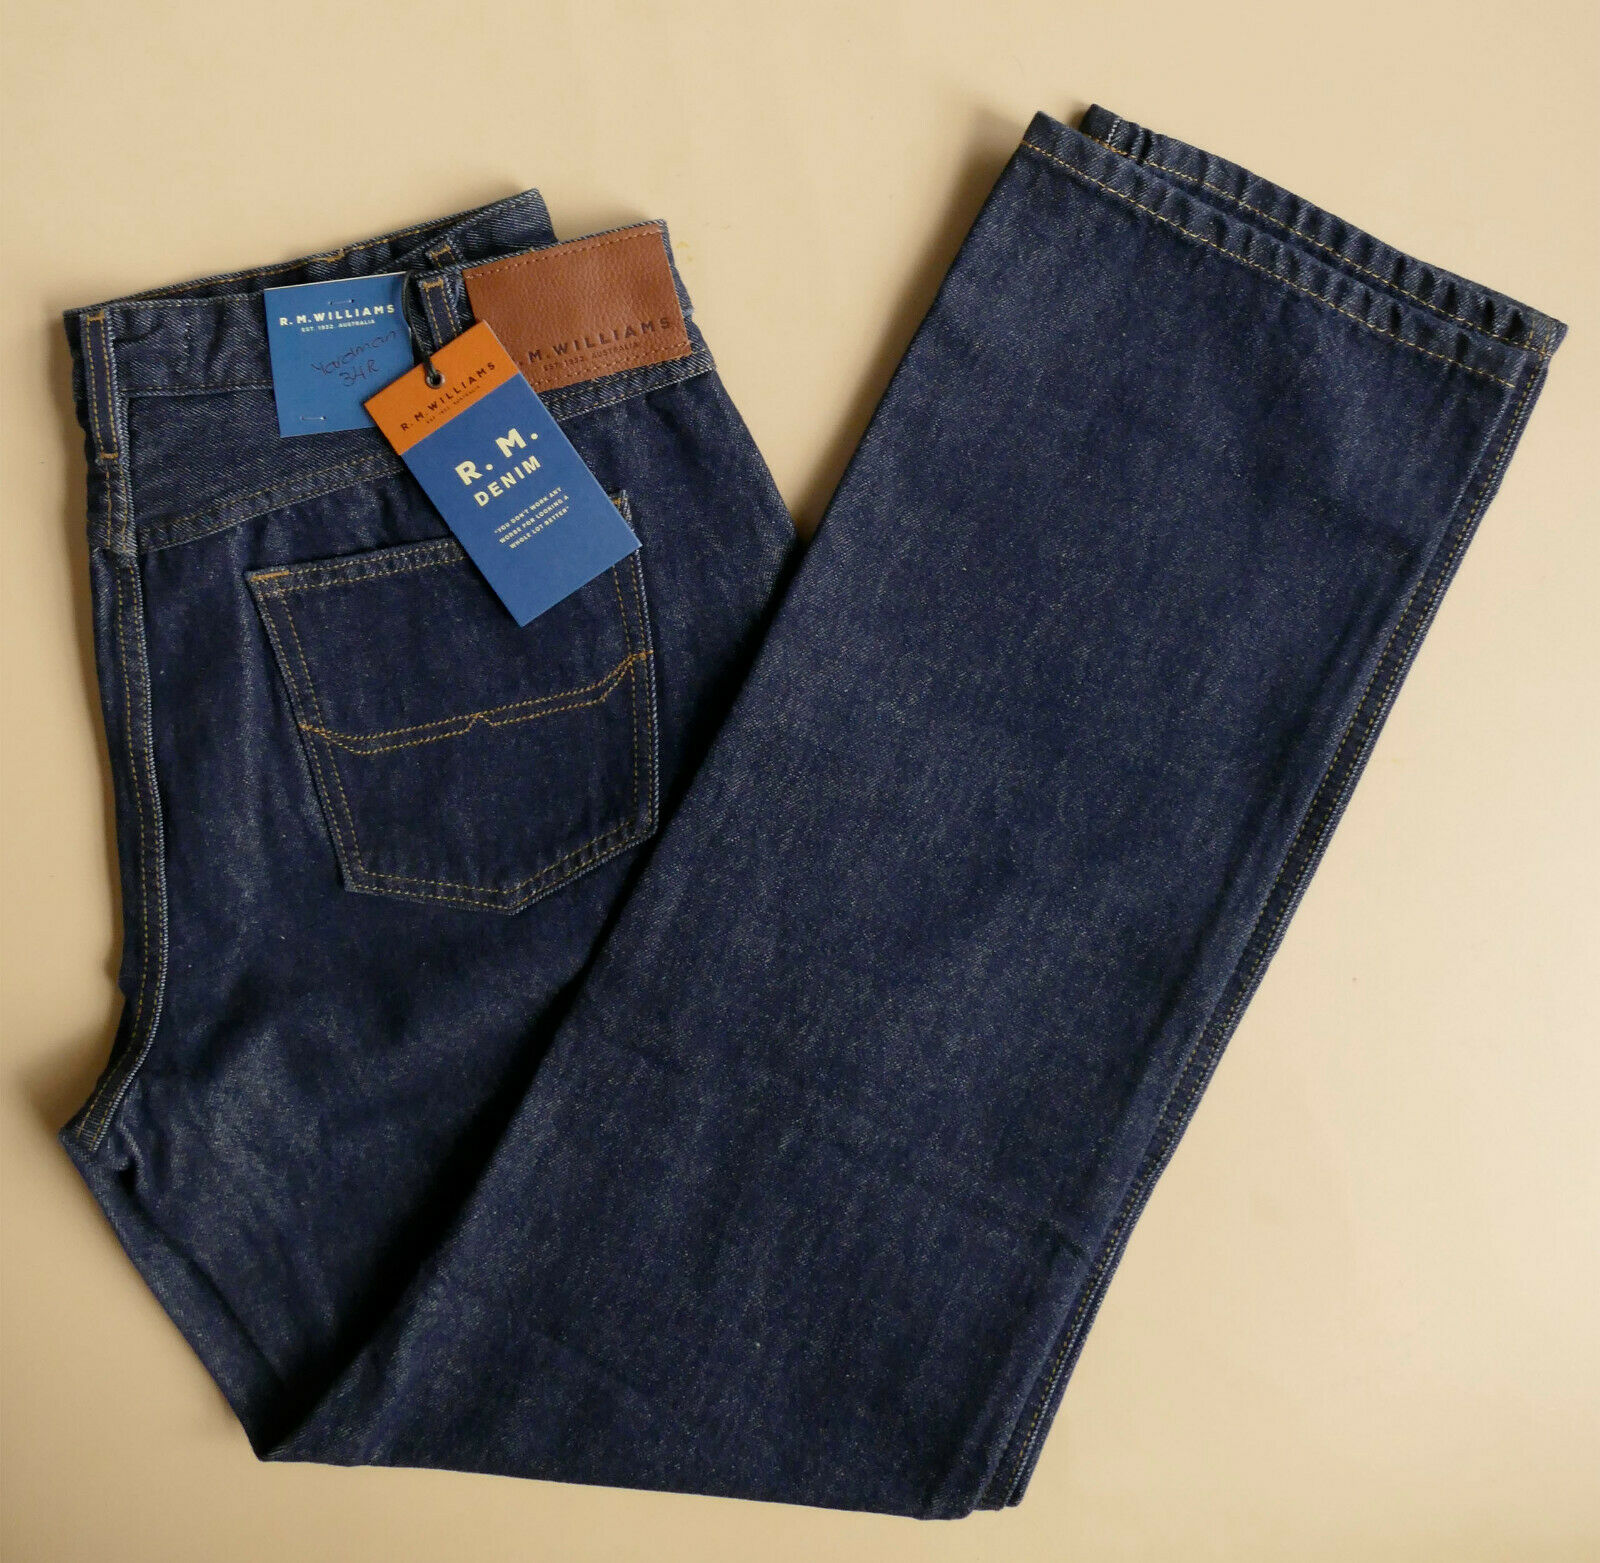 RM Williams Yardman jeans - size Waist 34 - NEW - BARGAIN